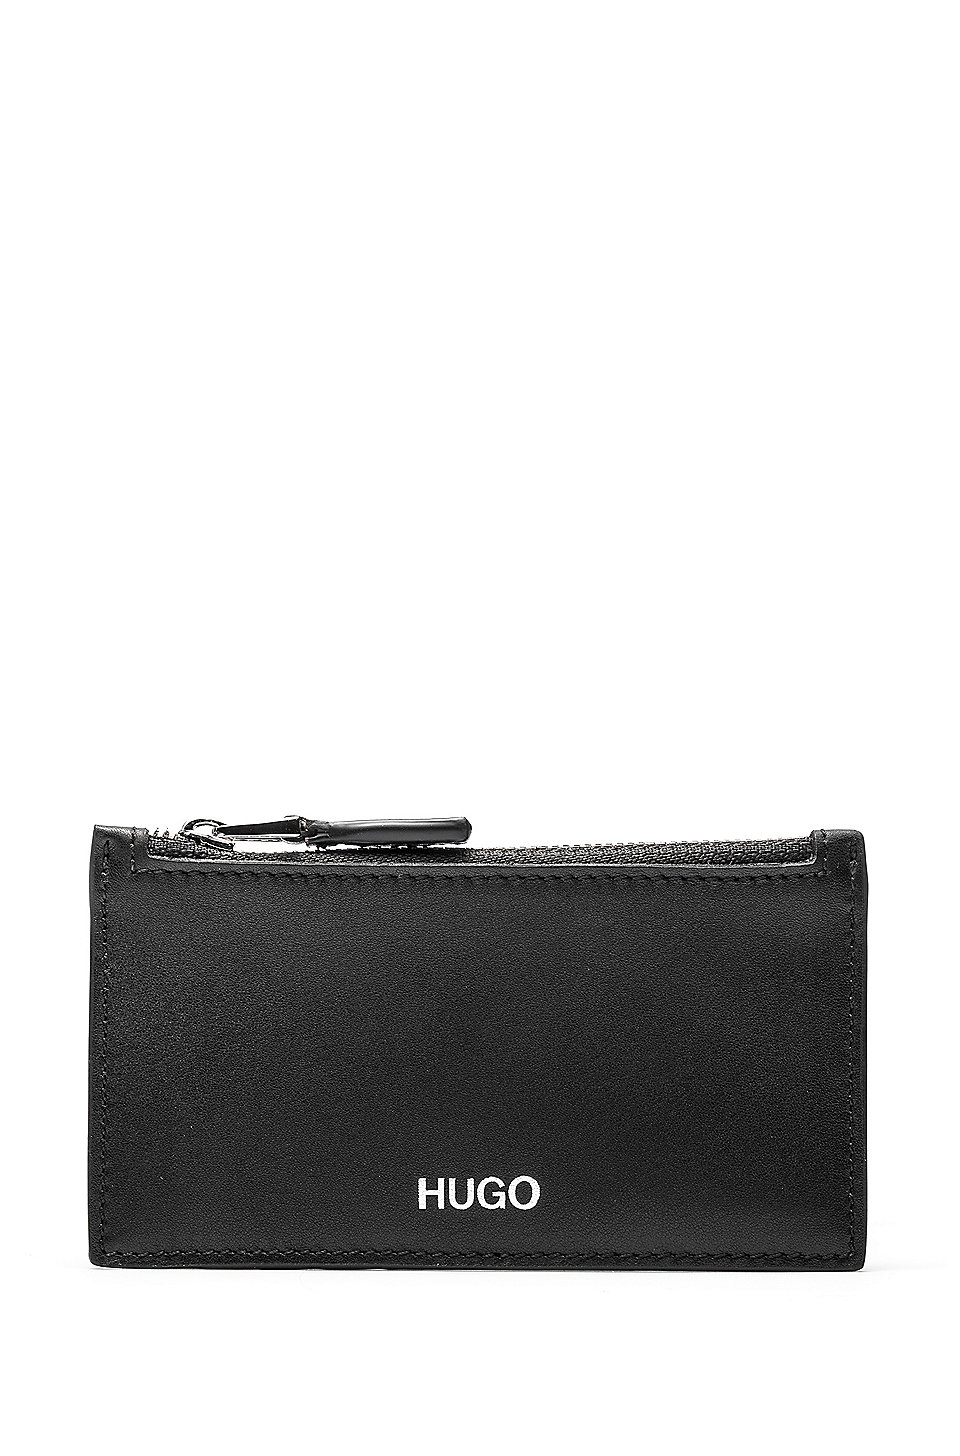 ddb92c2402f HUGO - Pasjeshouder van nappaleer met muntvakje met rits